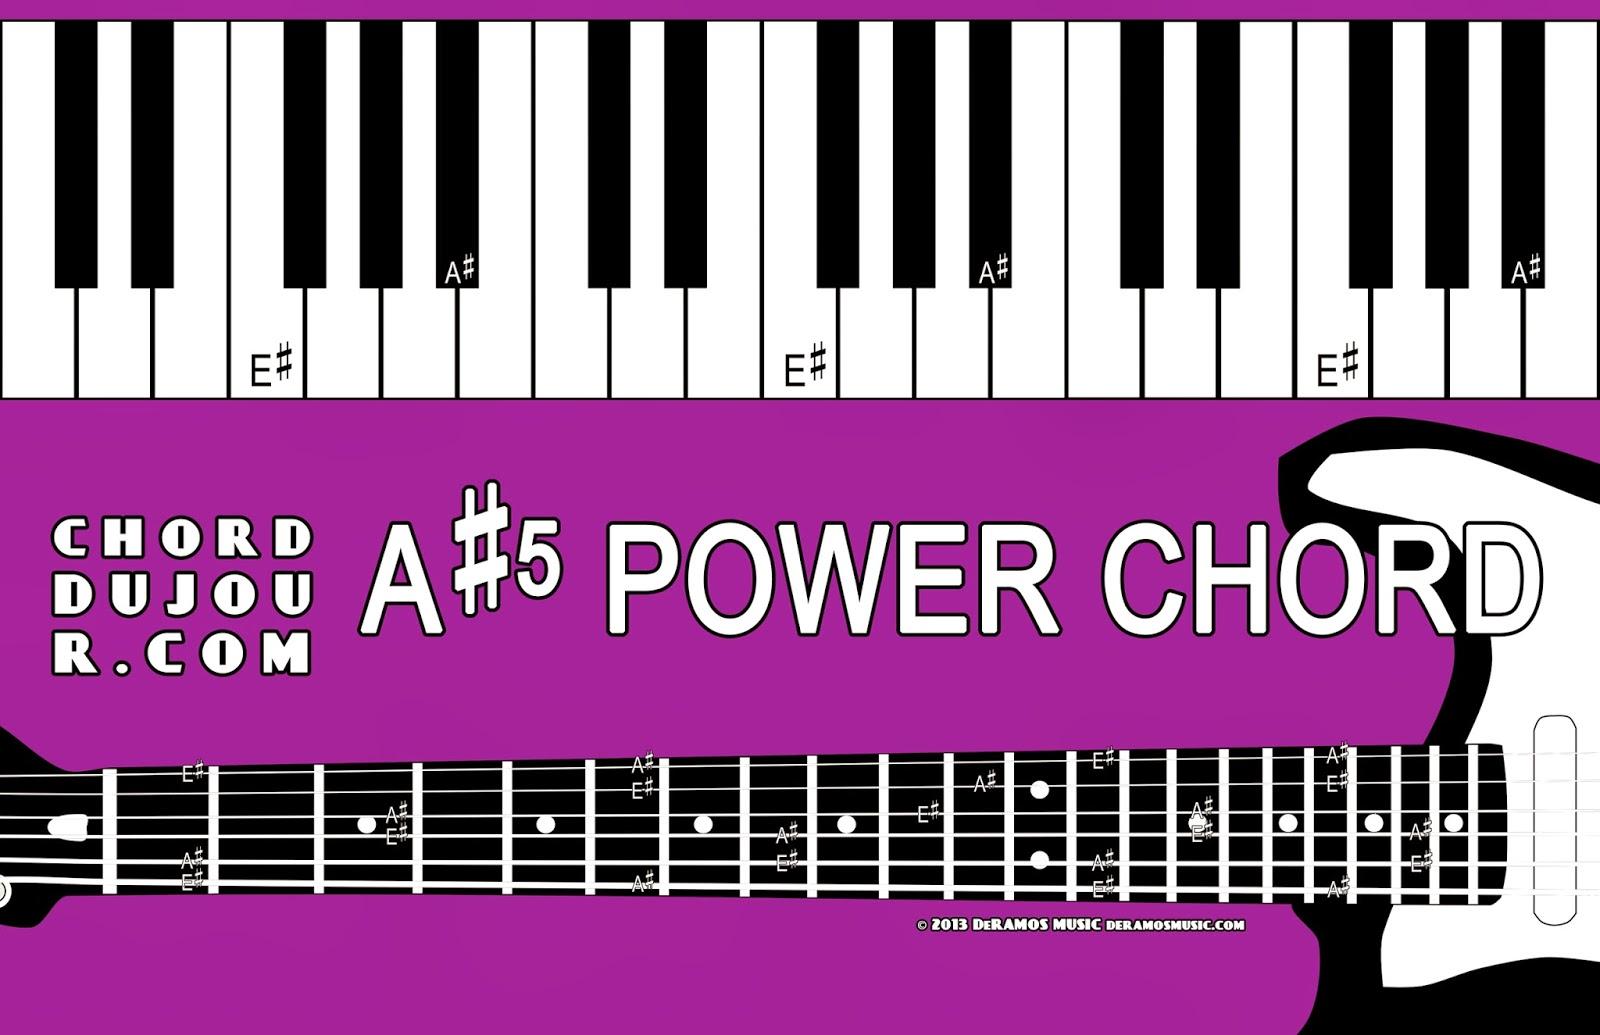 Chord du jour dictionary a5 power chord dictionary a5 power chord hexwebz Choice Image